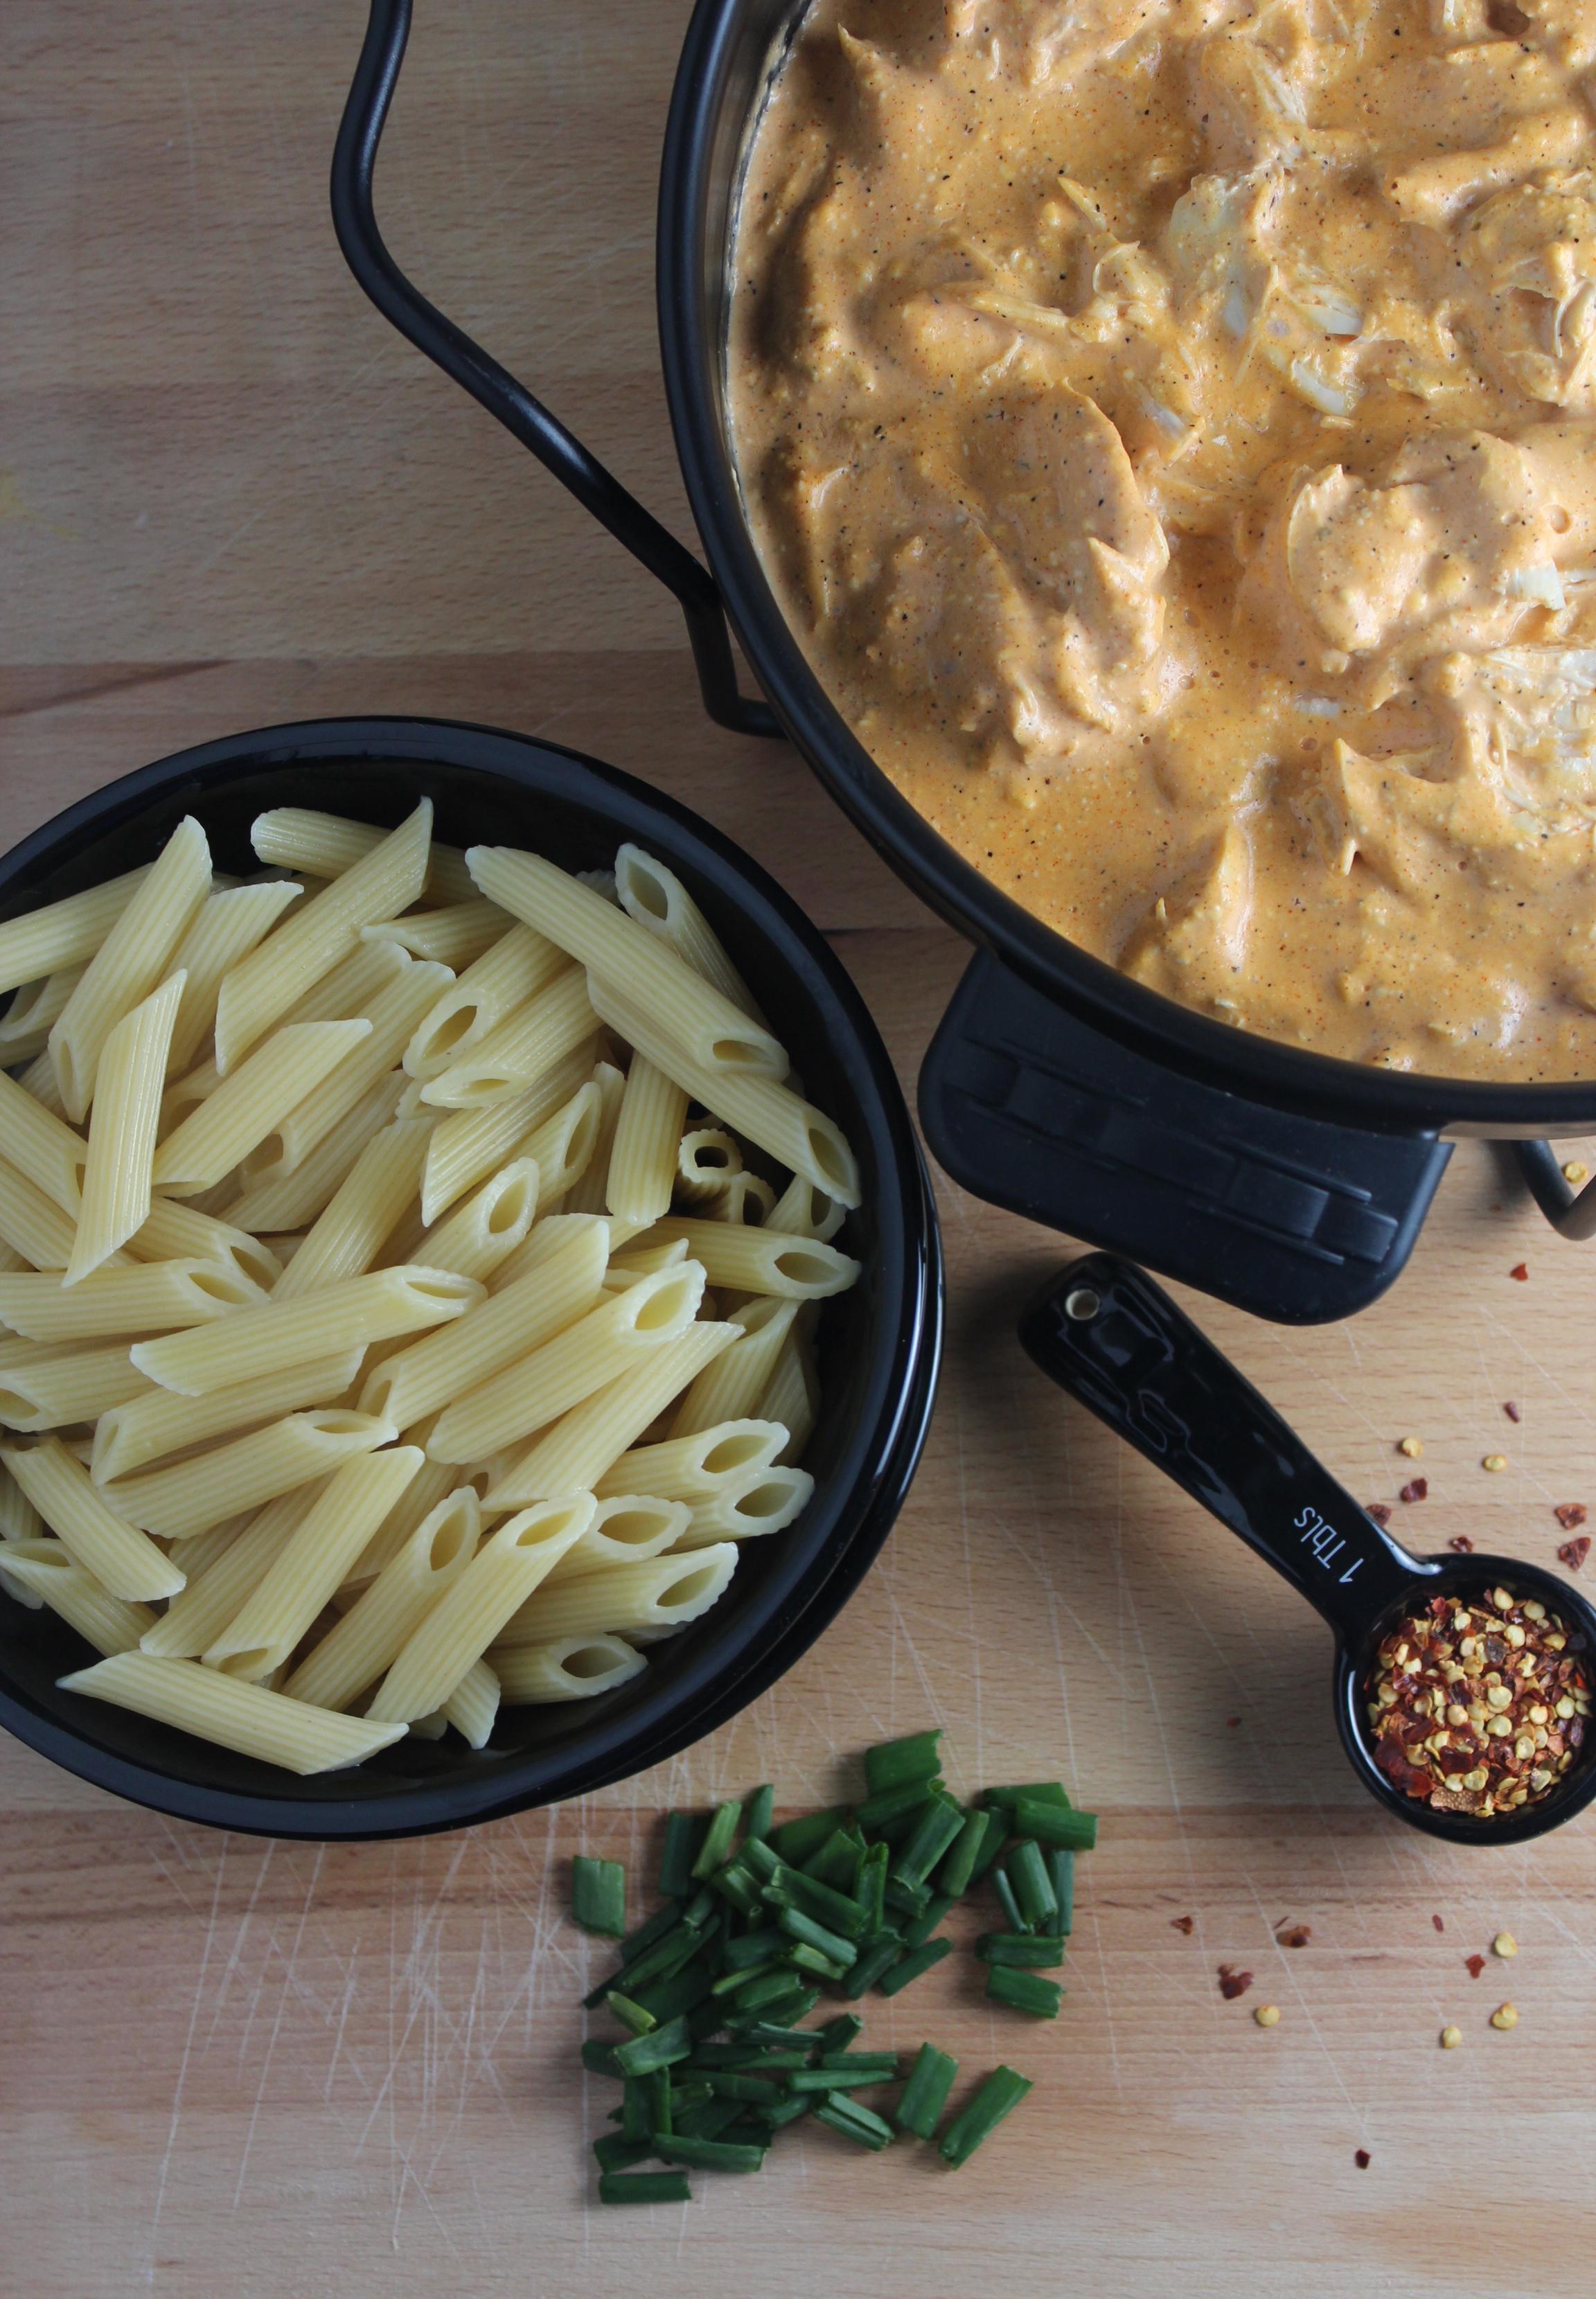 buffalo chicken, buffalo chicken pasta, cheesy buffalo chicken pasta, penne pasta, cheesy pasta, recipes, food, buffalo pasta with cheese, buffalo mac and cheese